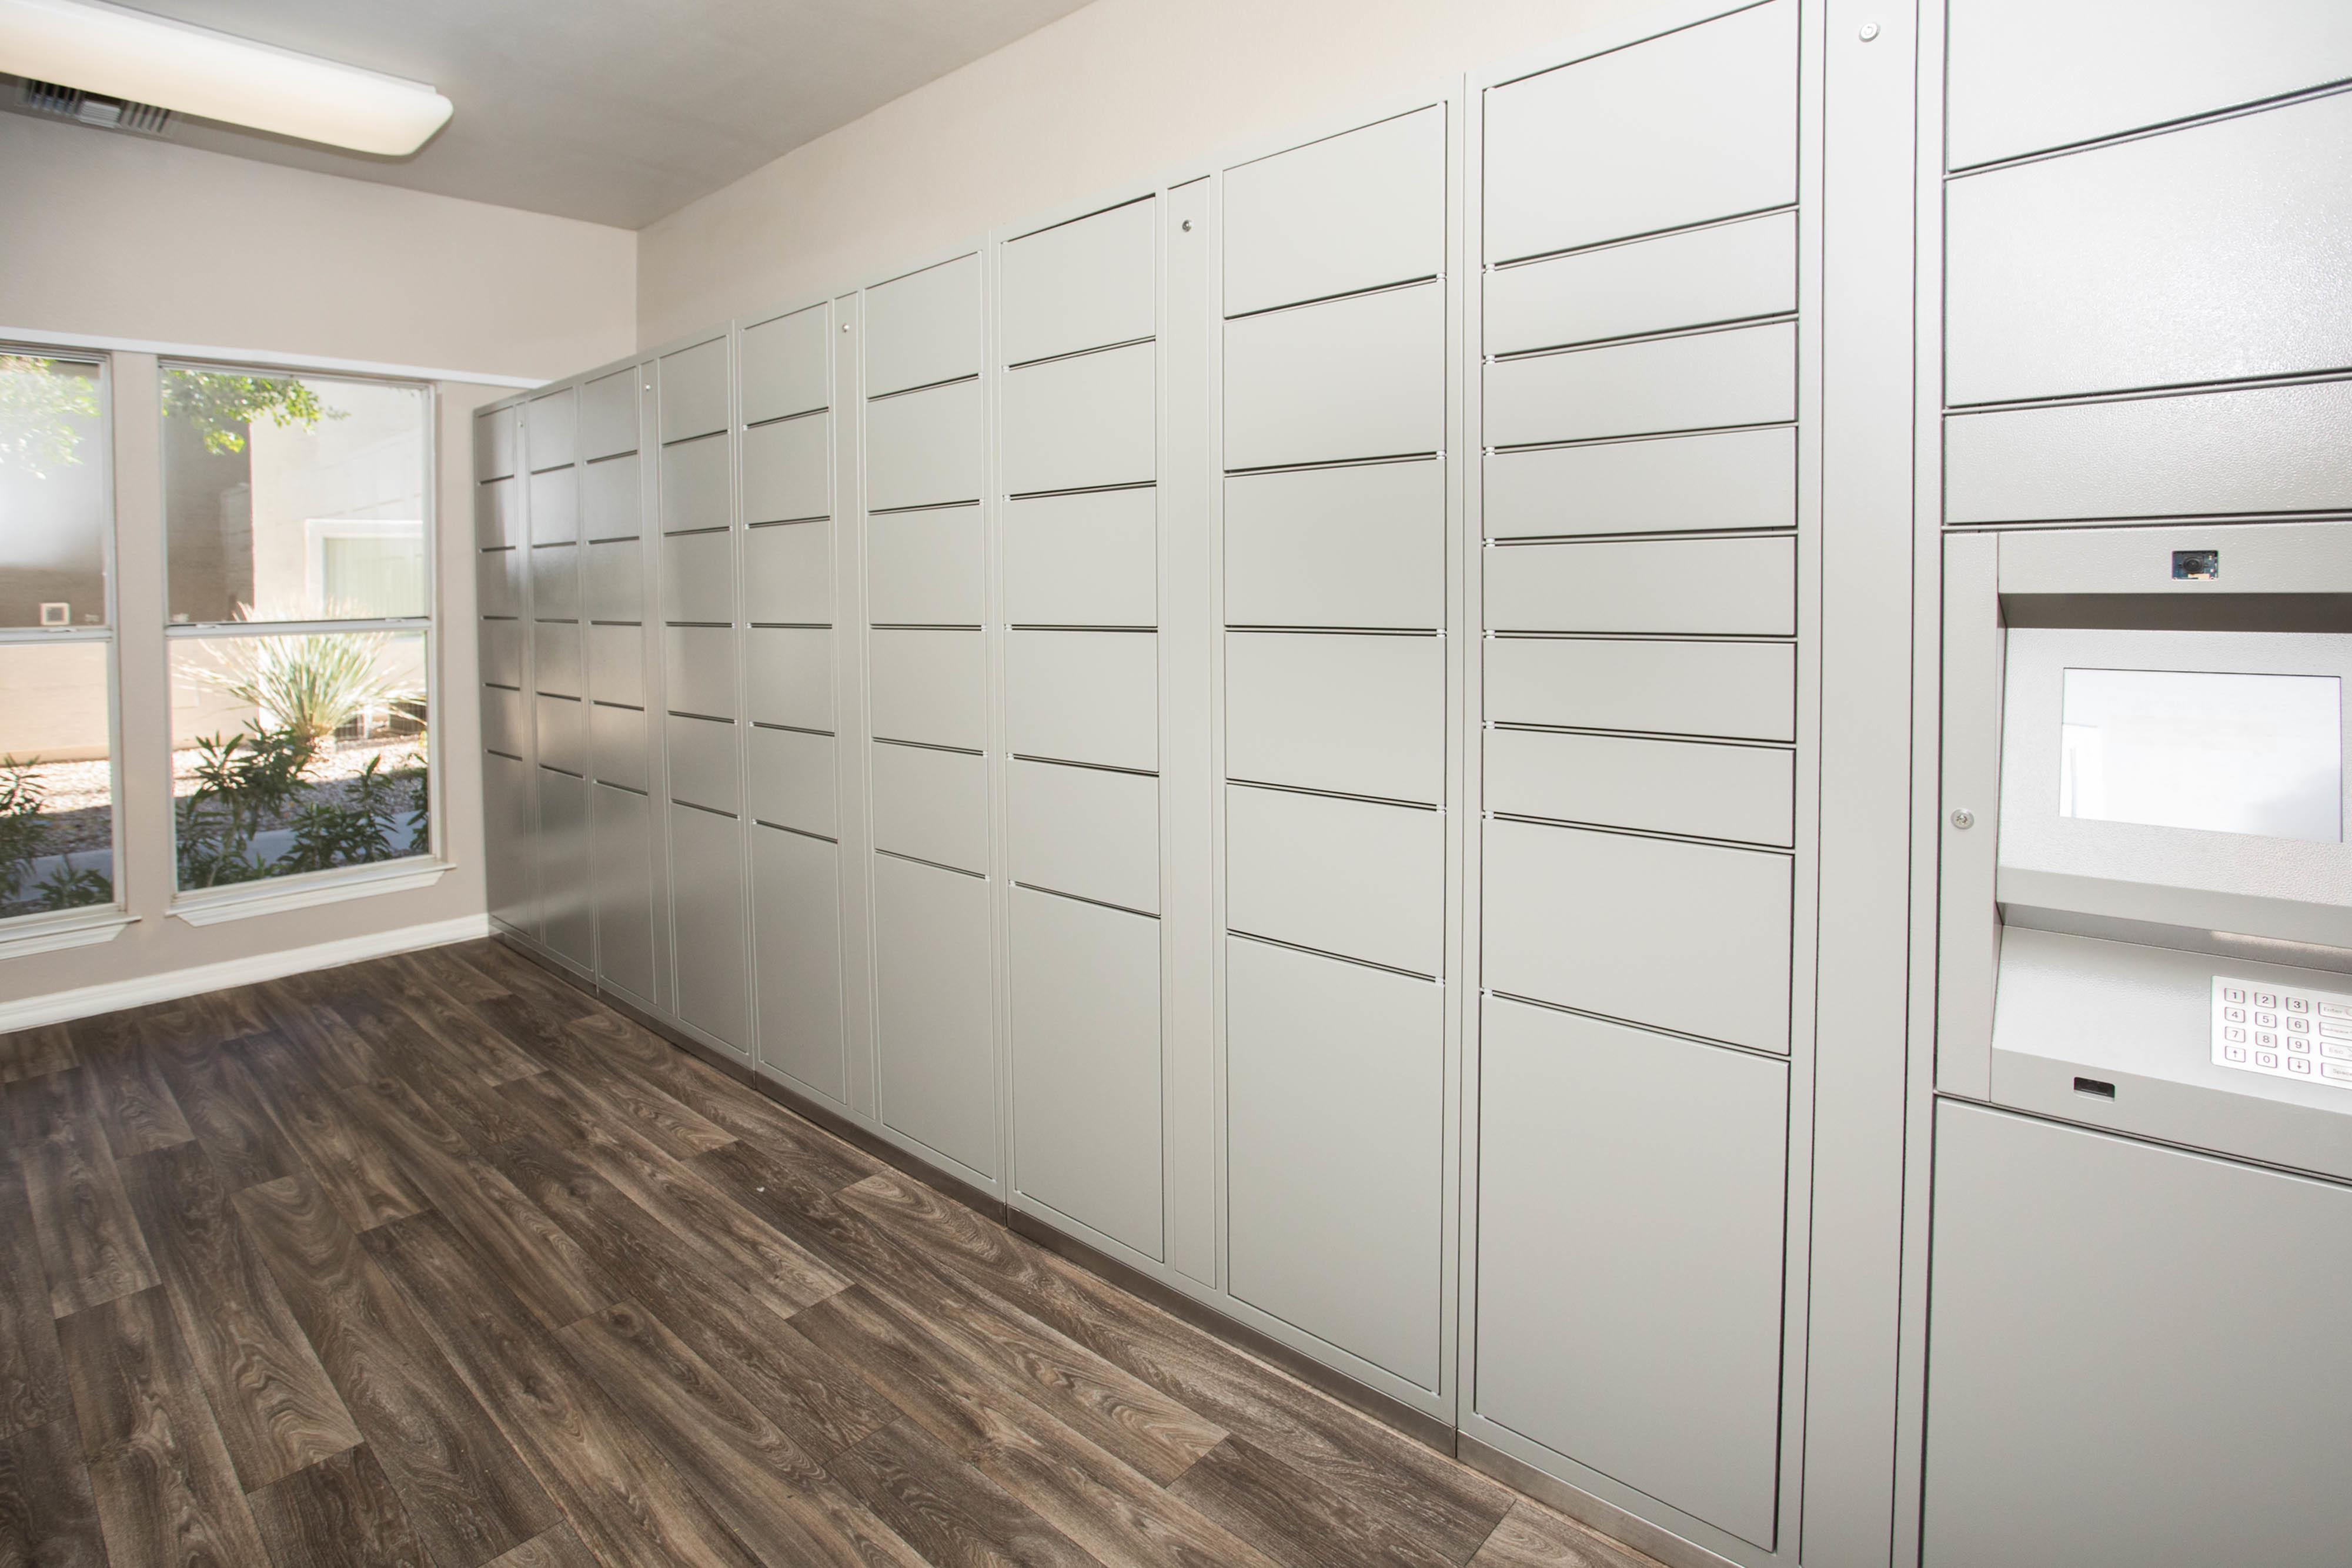 Resident Locker System| Phoenix AZ Apartments For Rent | Arboretum at South Mountain